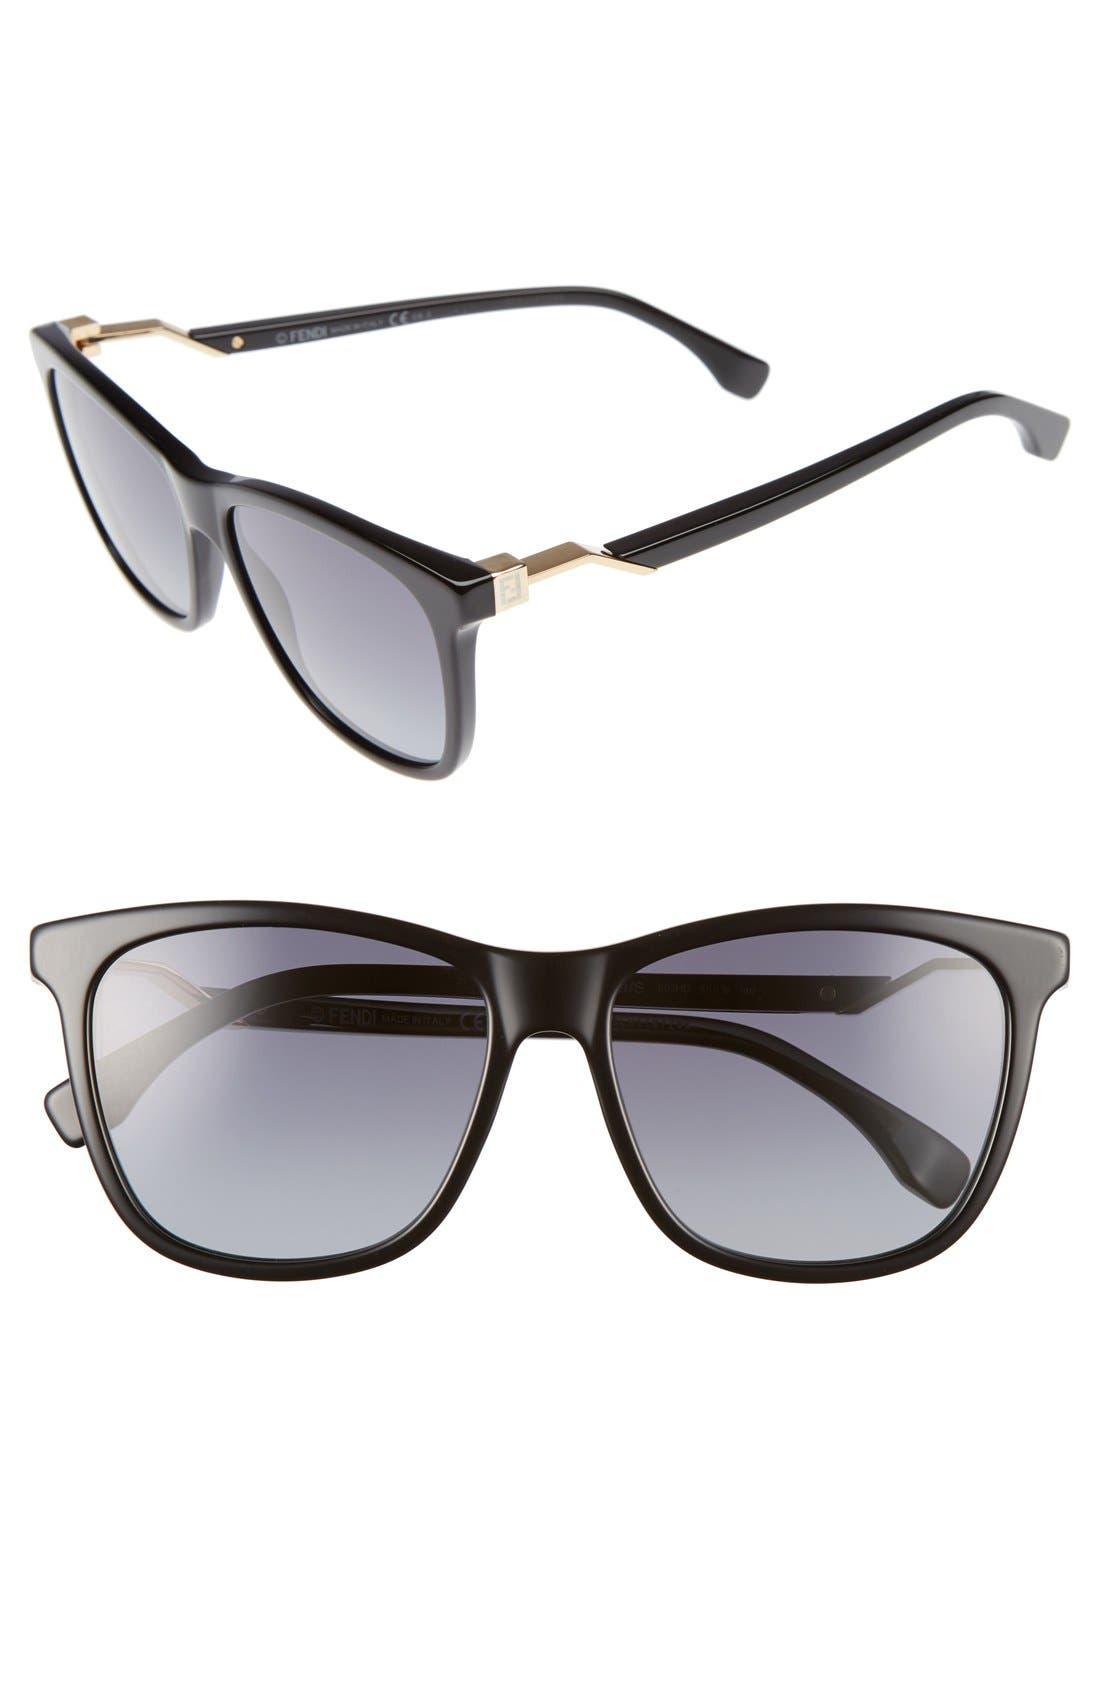 55mm Cube Retro Sunglasses,                             Main thumbnail 1, color,